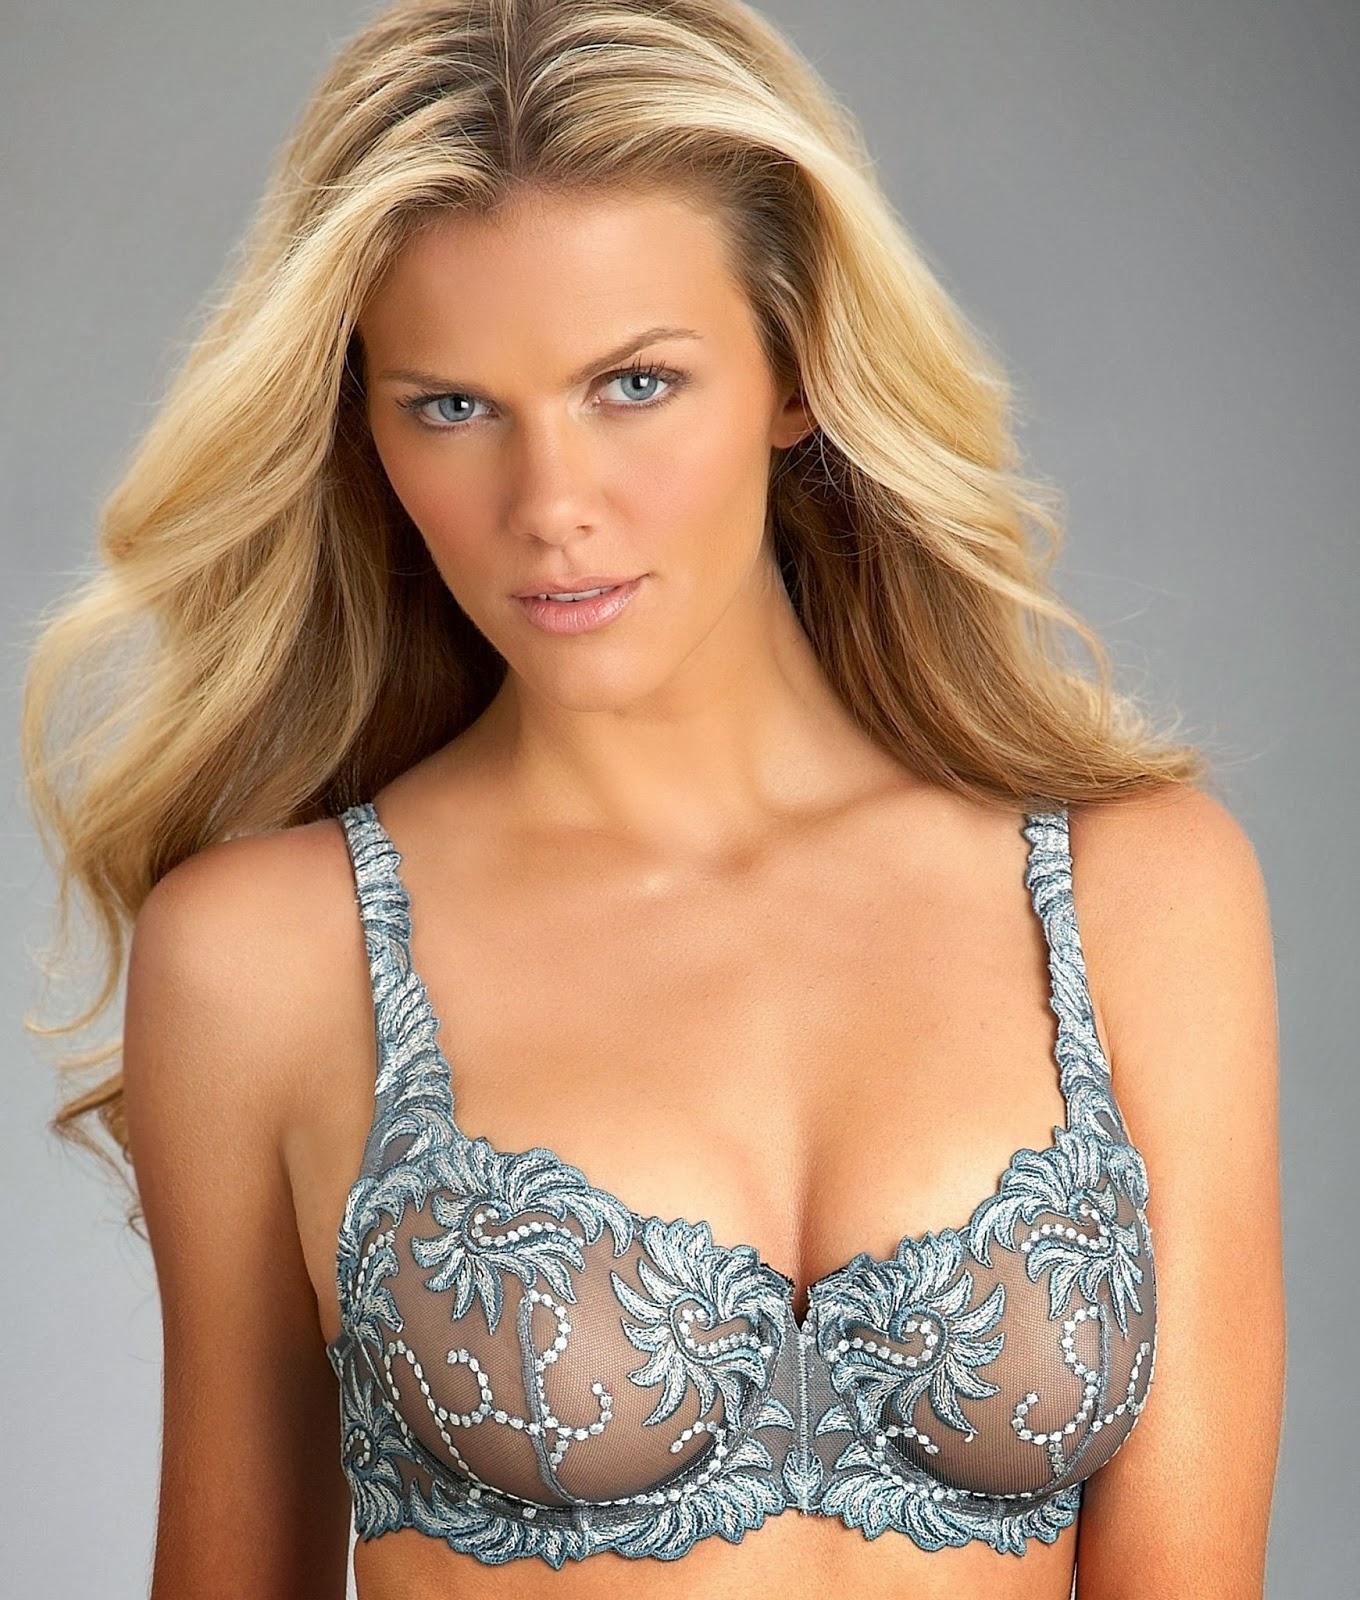 Brooklyn Decker Usa Hot And Beautiful Women Of The World